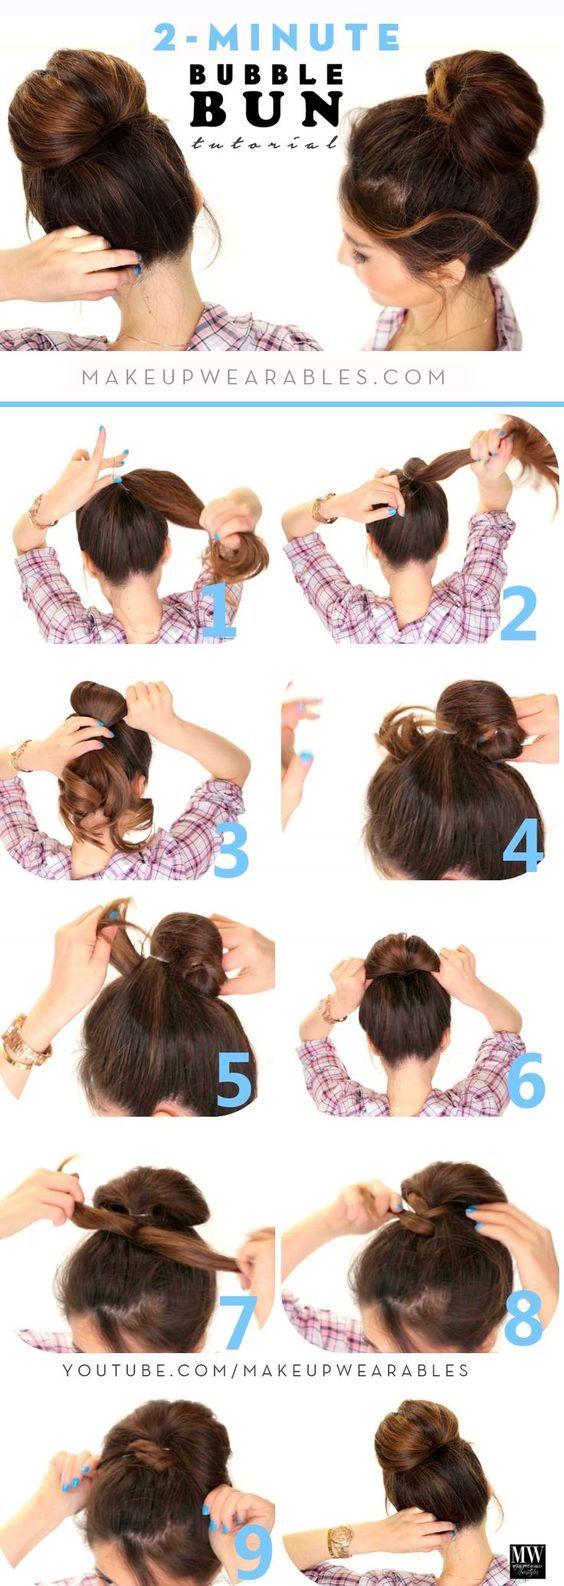 DIY Women's Hairstyles Bubble Bun